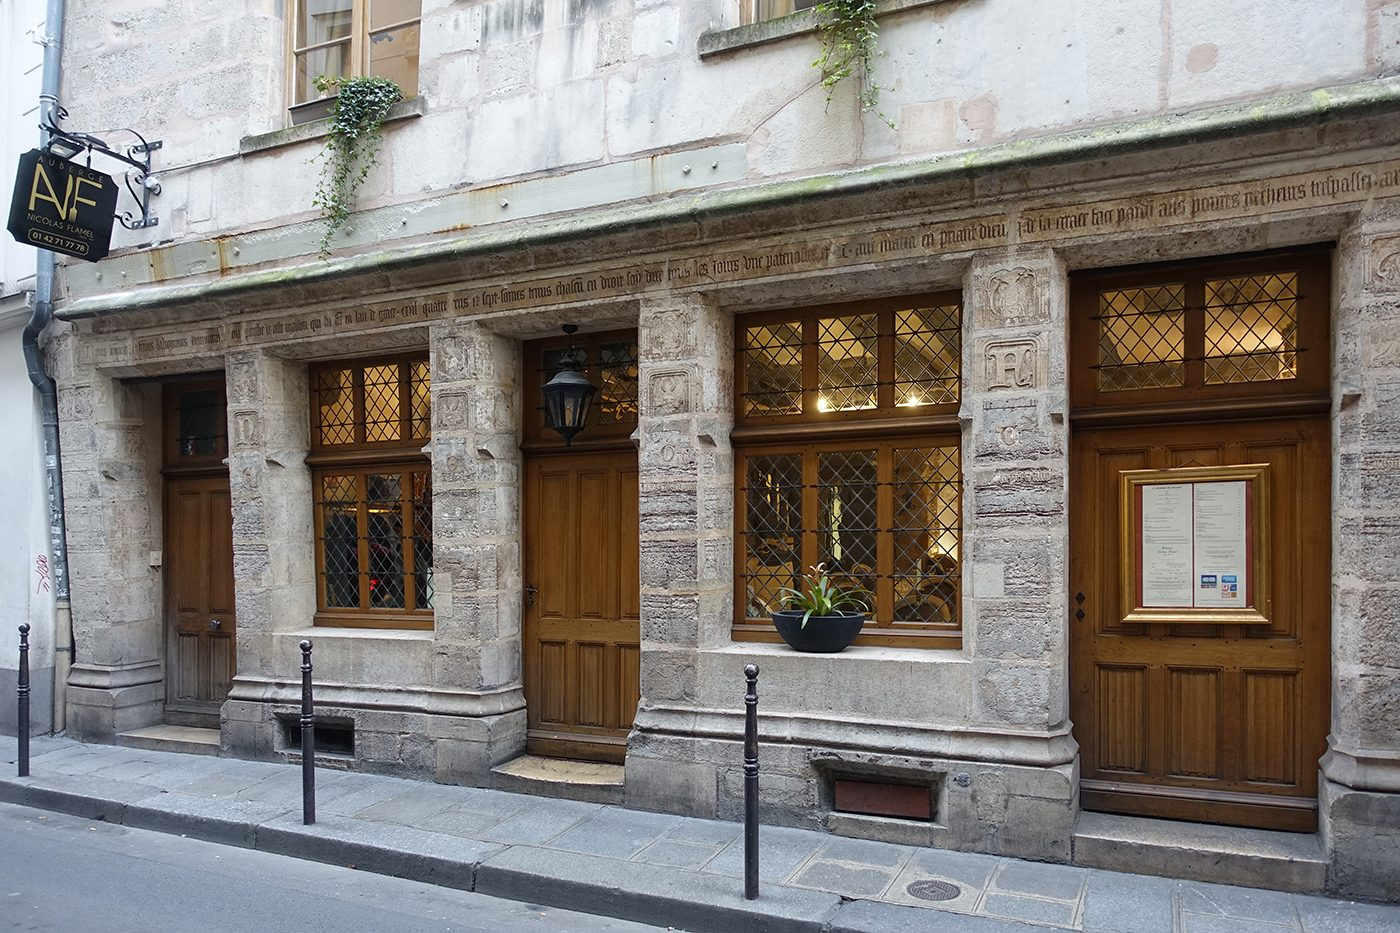 Le Marais Paris - Auberge Nicolas Flamel